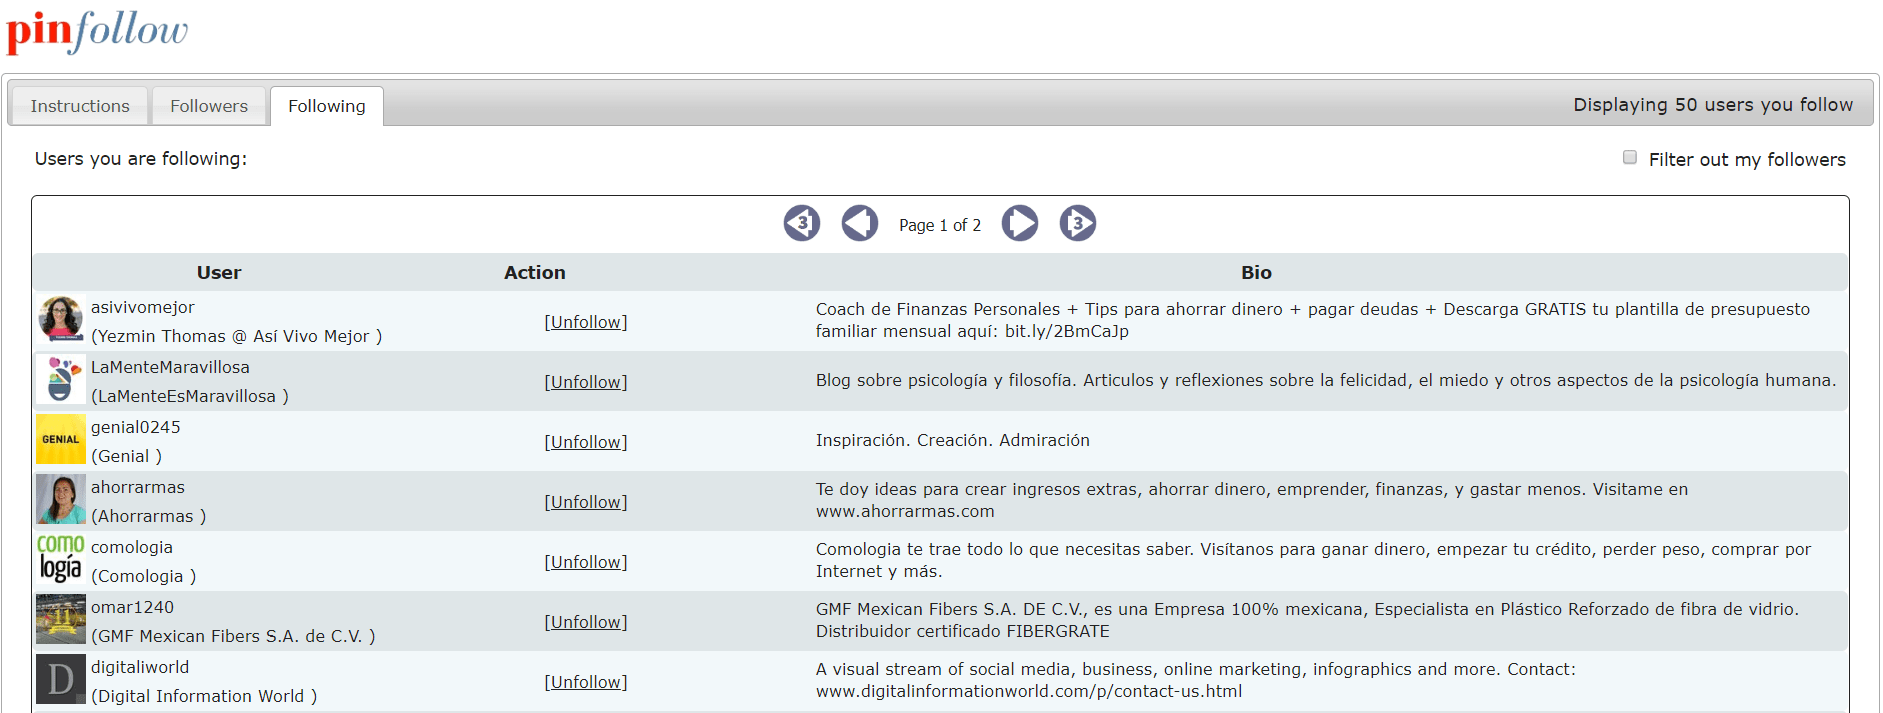 Ejemplo de la interfaz de PinFollow